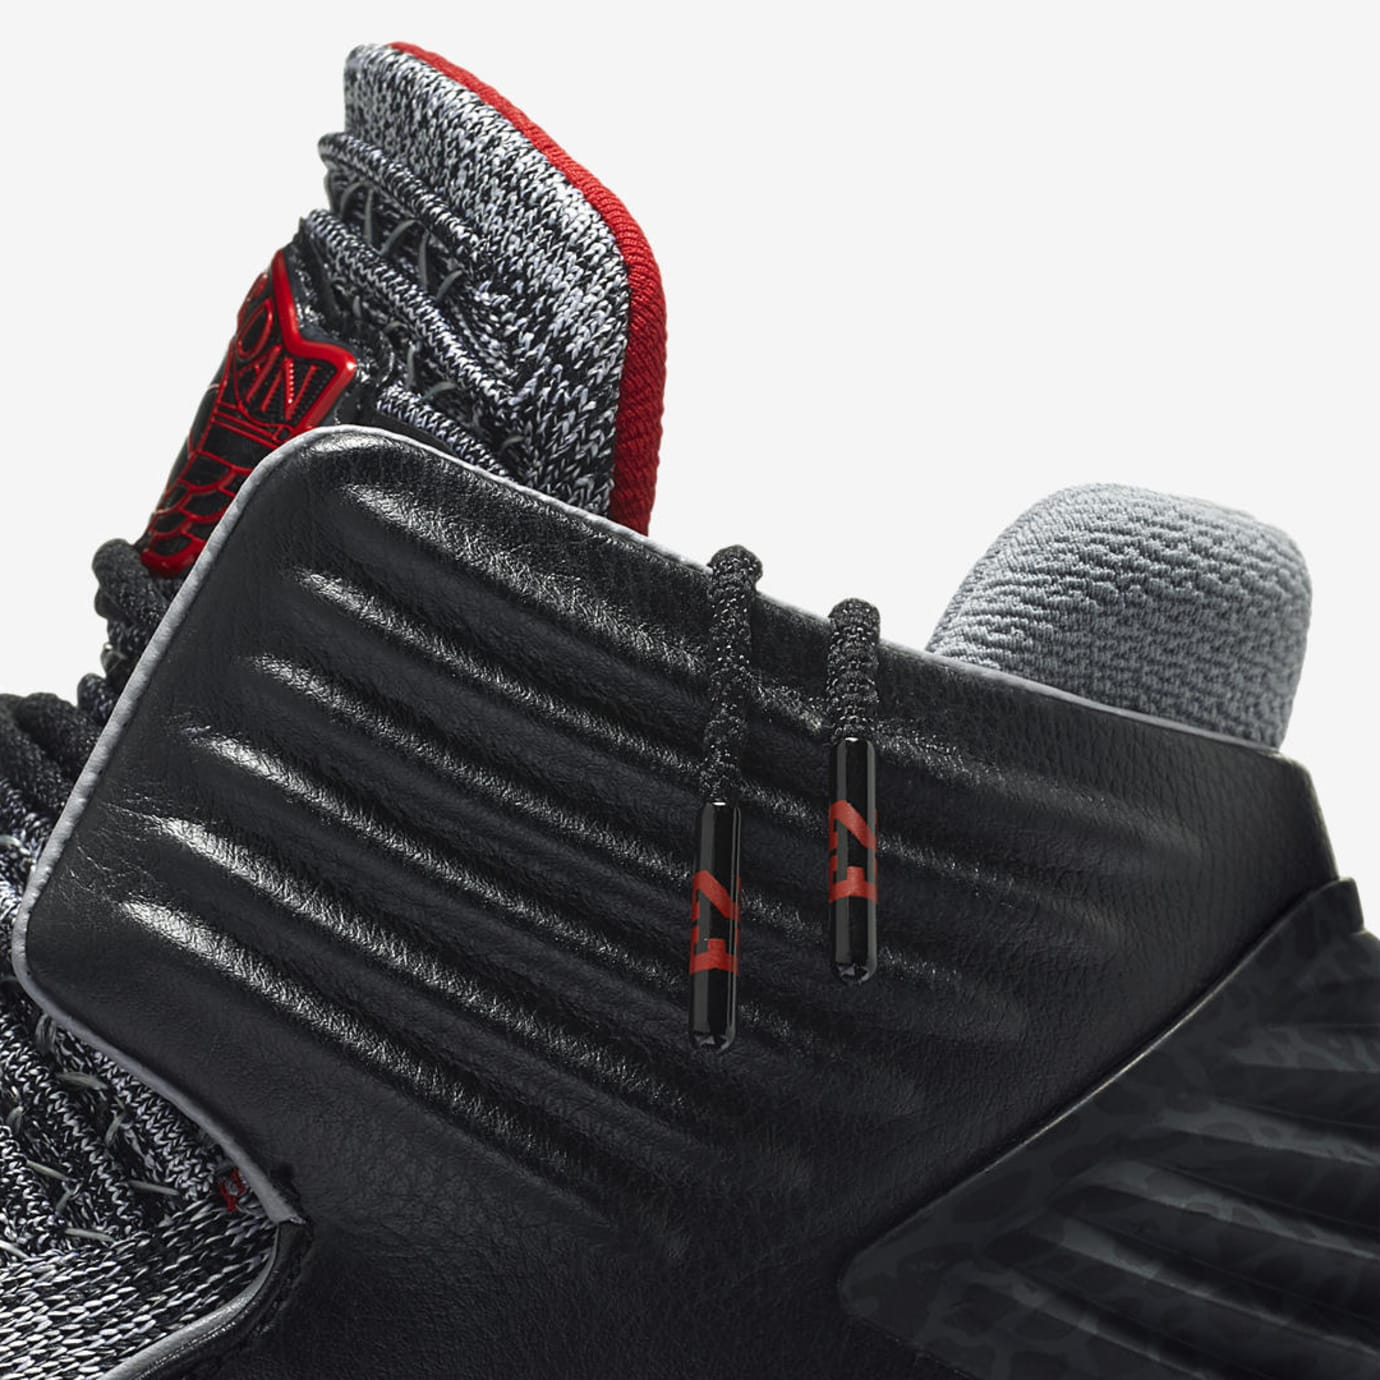 Air Jordan 32 MVP Black Cement AA1253-002 Ankle